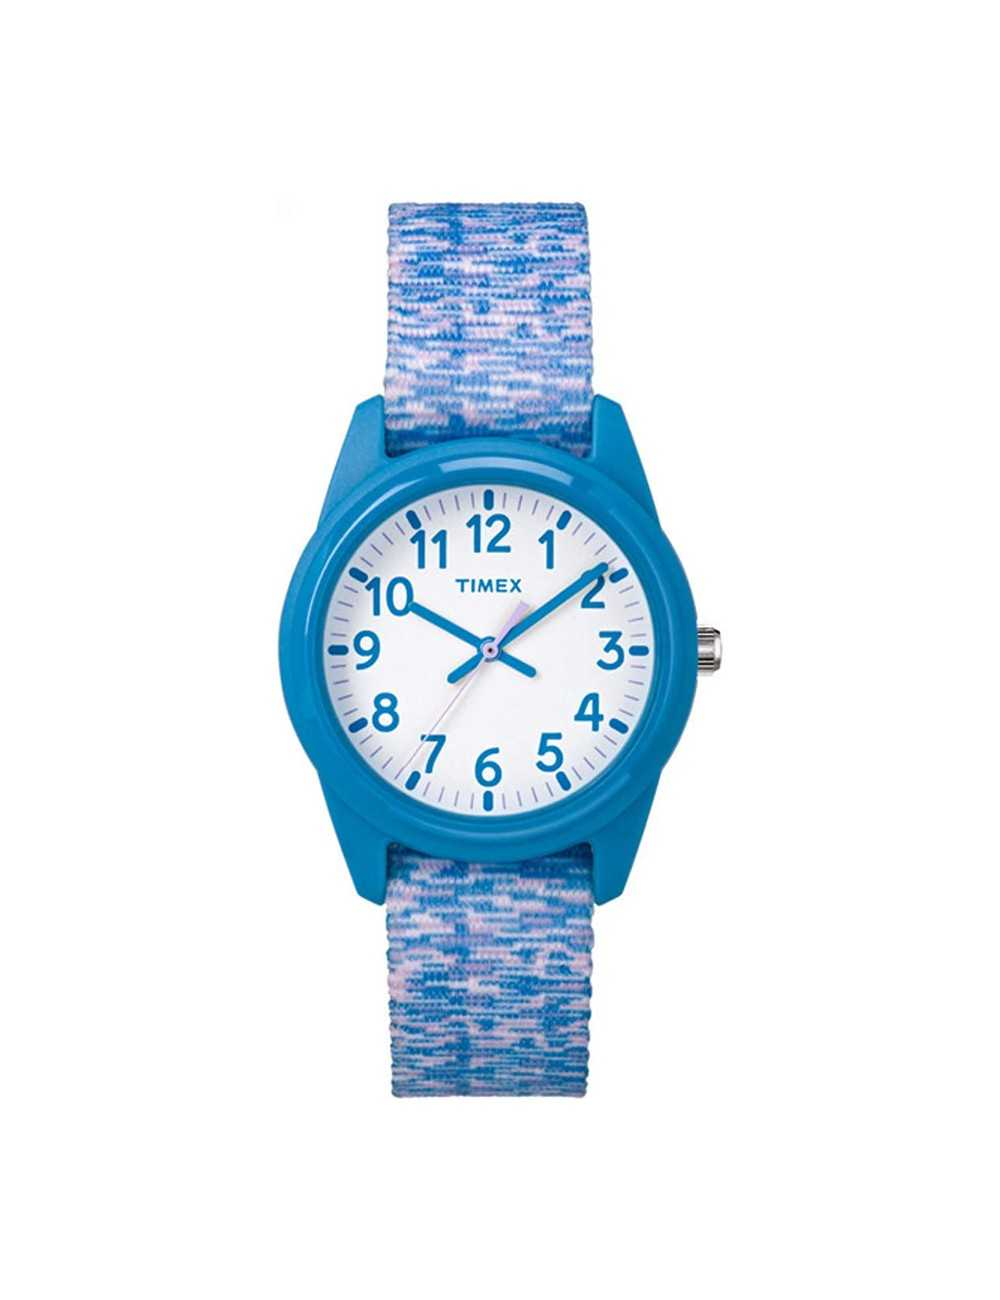 Detské hodinky Timex Youth Time Machines TW7C12100